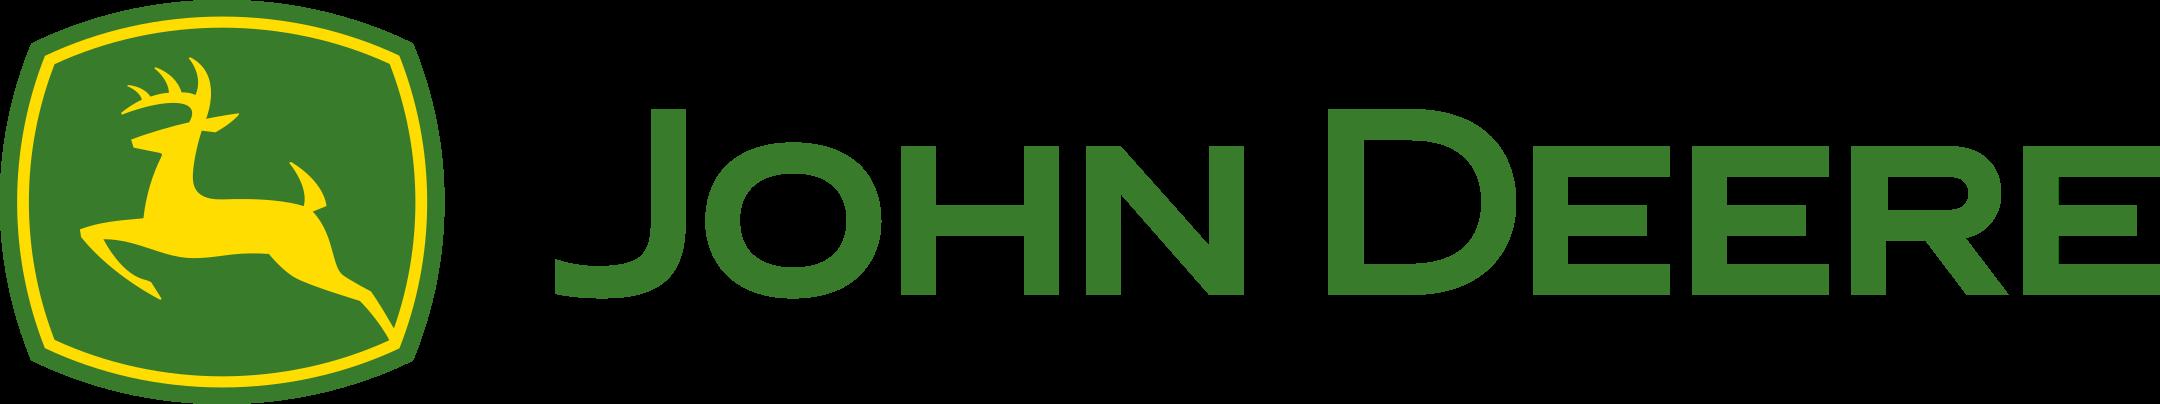 john deere logo 1 - John Deere Logo